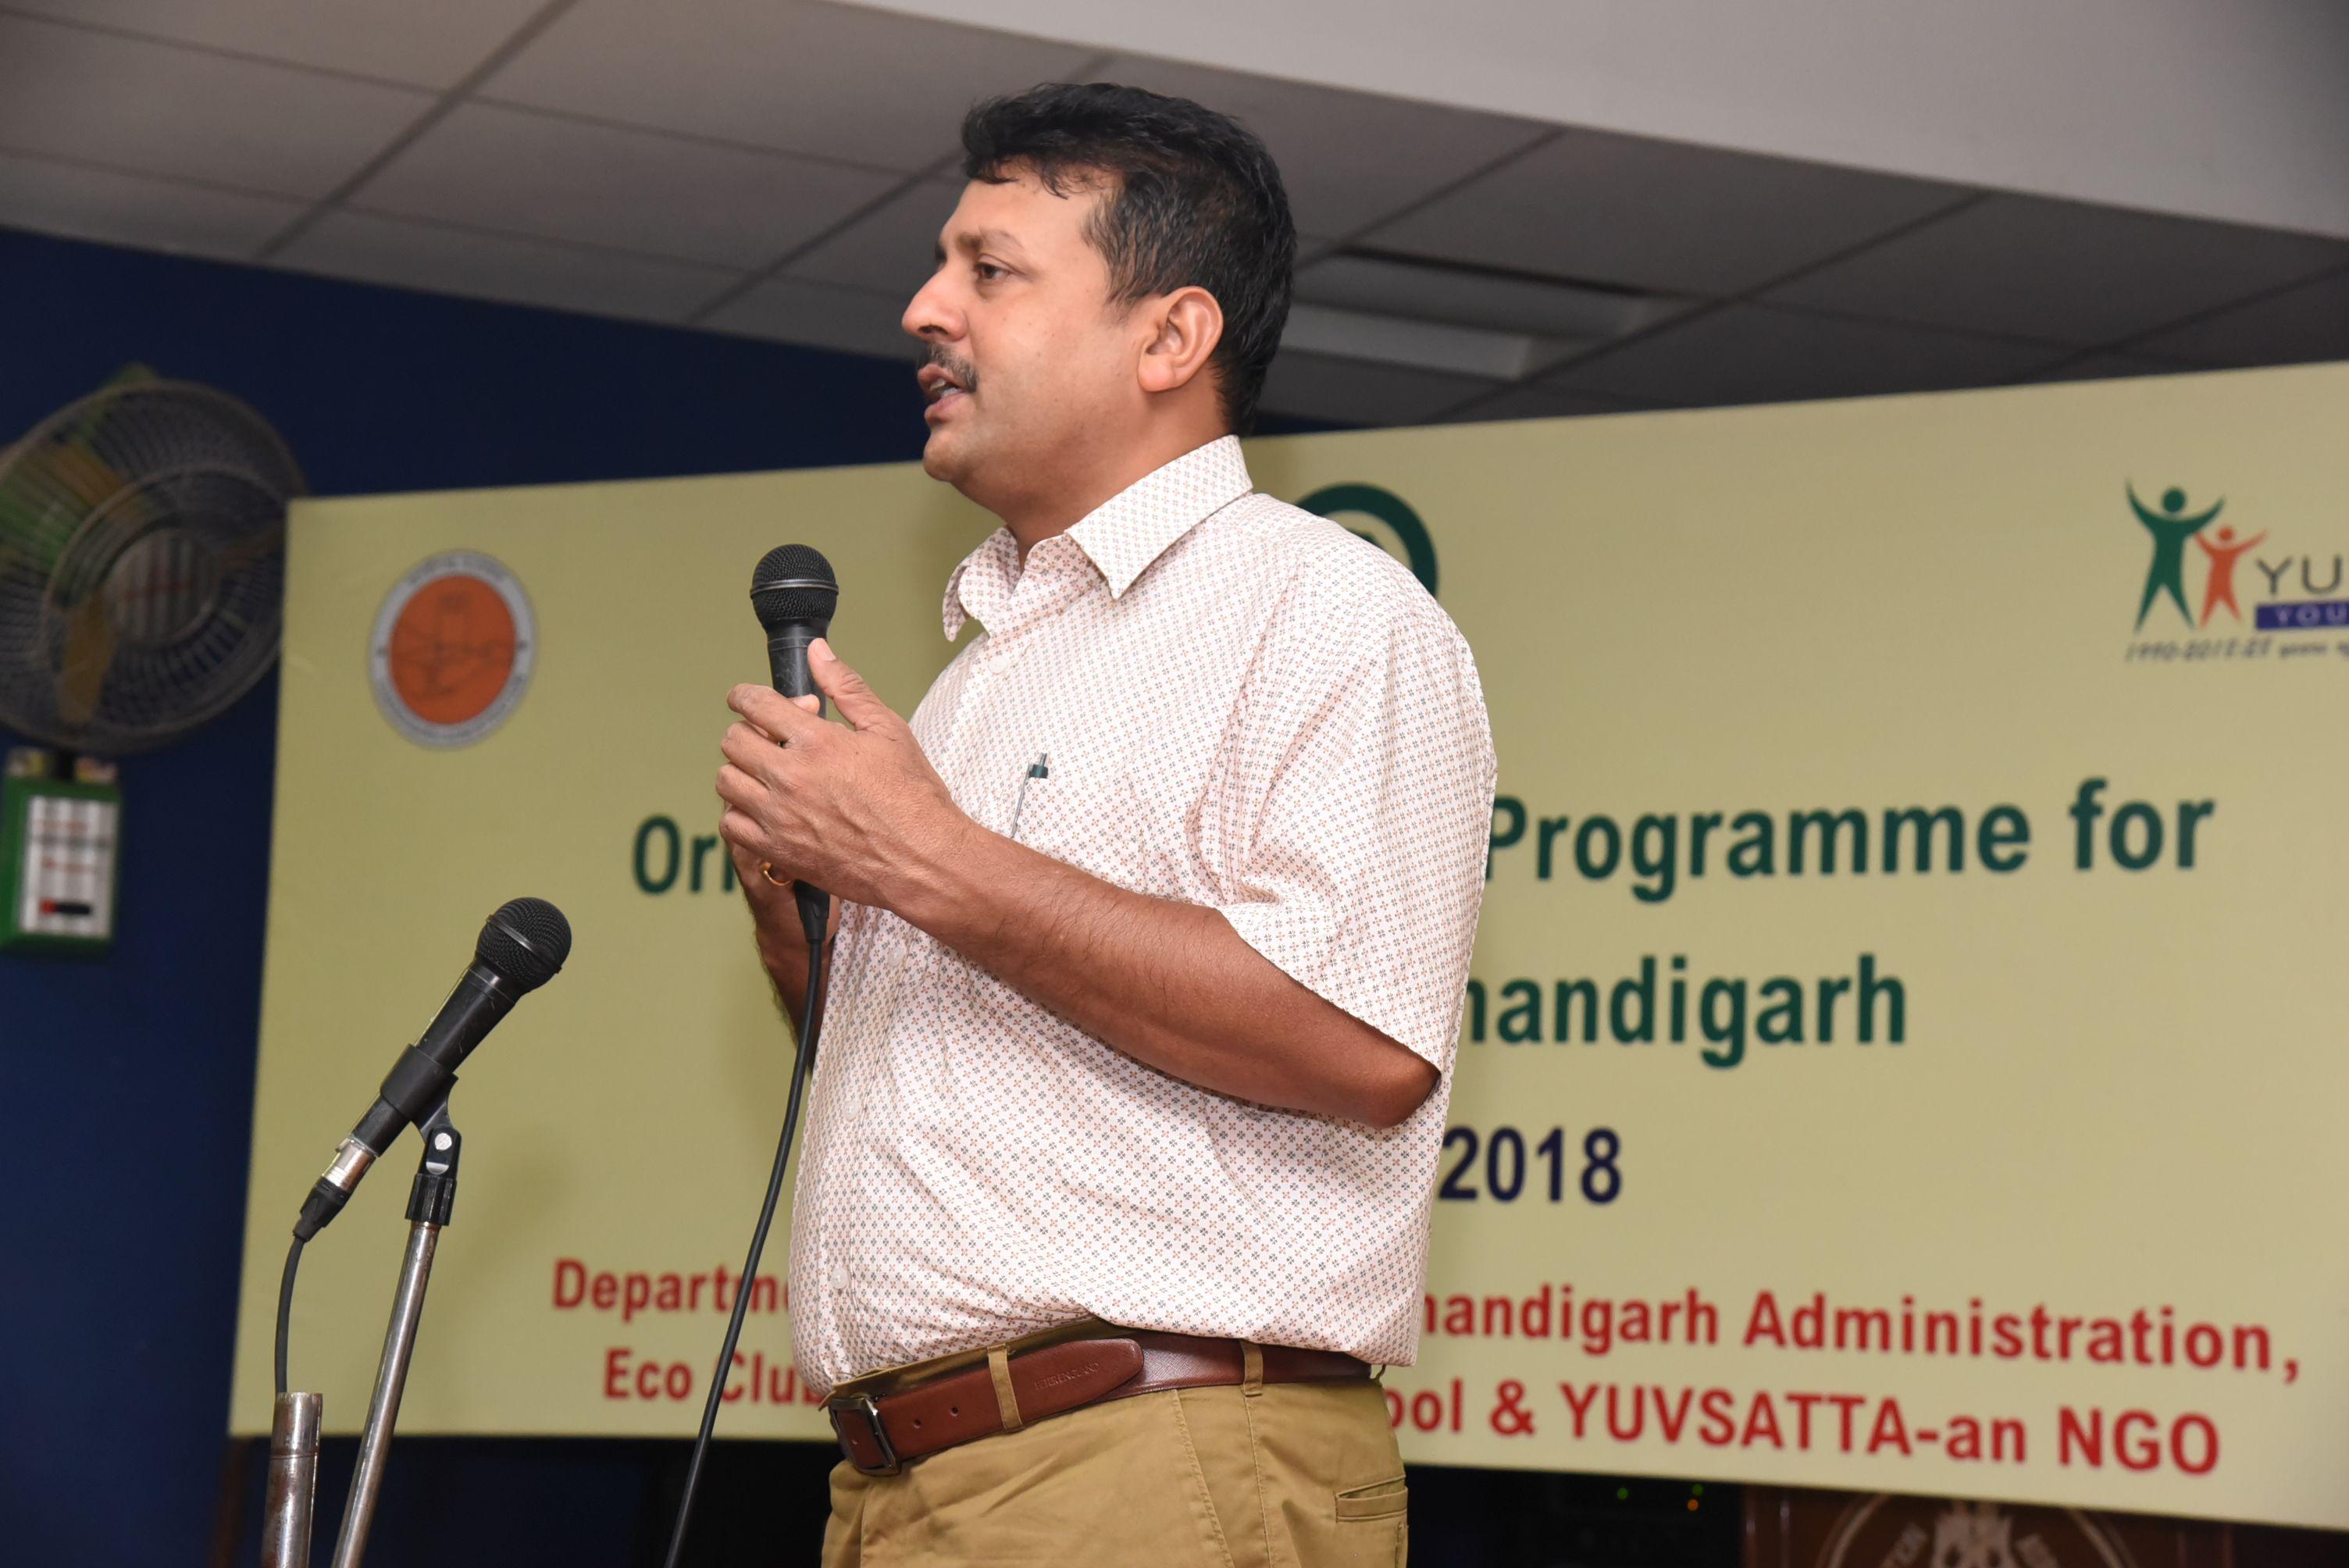 Mr. Santosh Kumar addressing the gathering